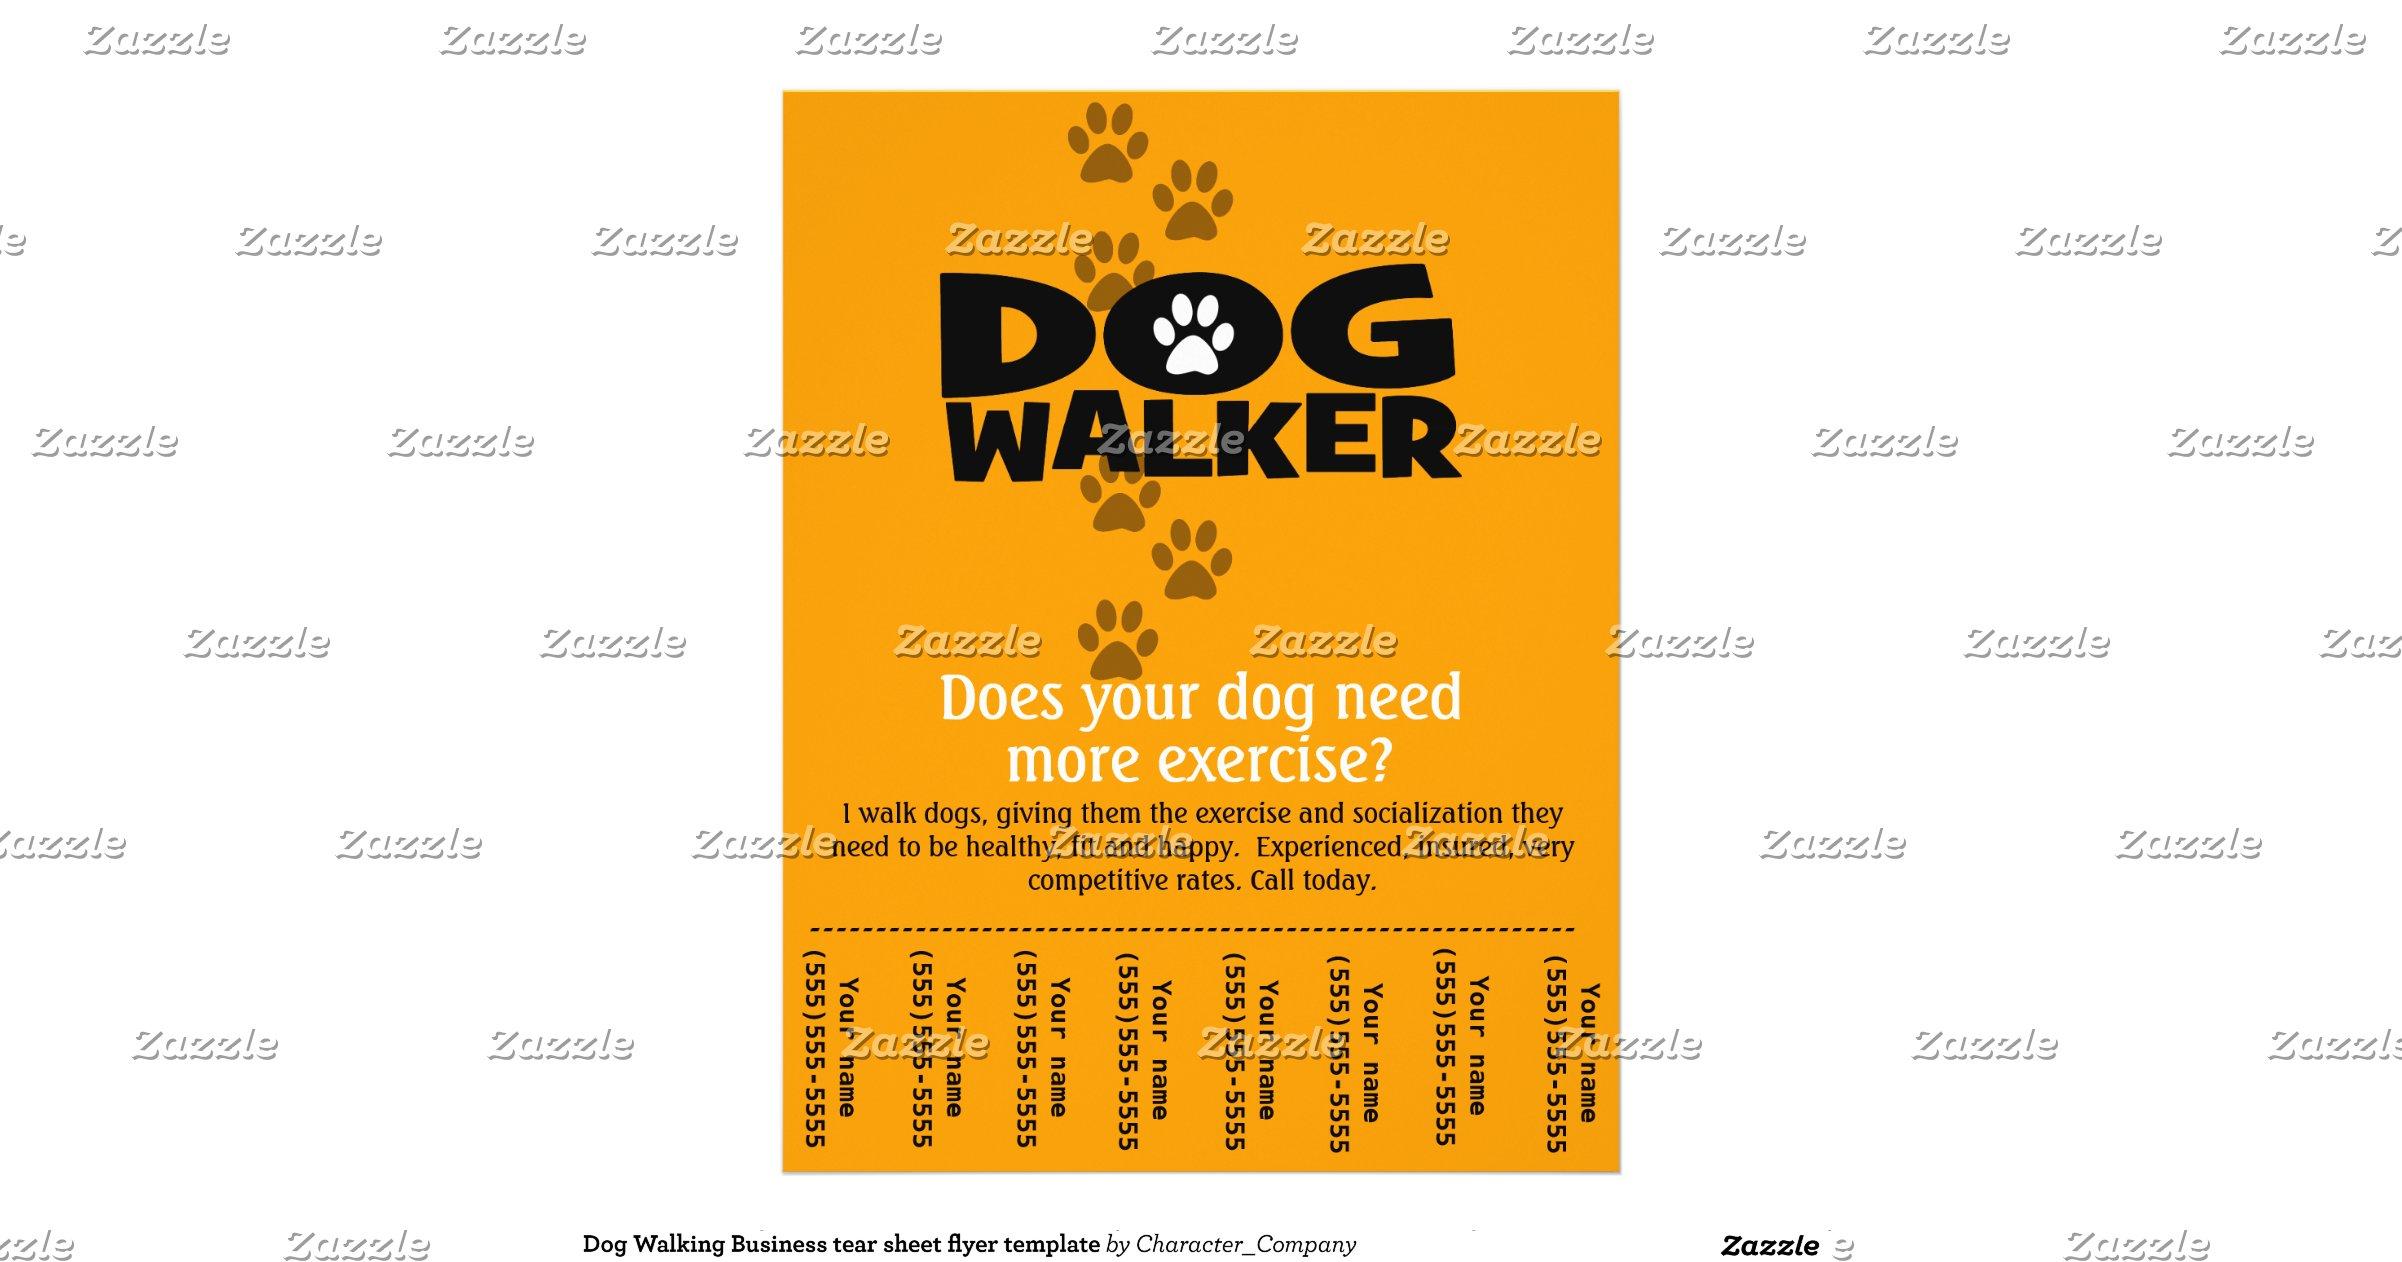 dog walking business tear sheet flyer template rddb2fce081c149e3bd1cff9c438a0ac4 vgvyf 8byvr. Black Bedroom Furniture Sets. Home Design Ideas